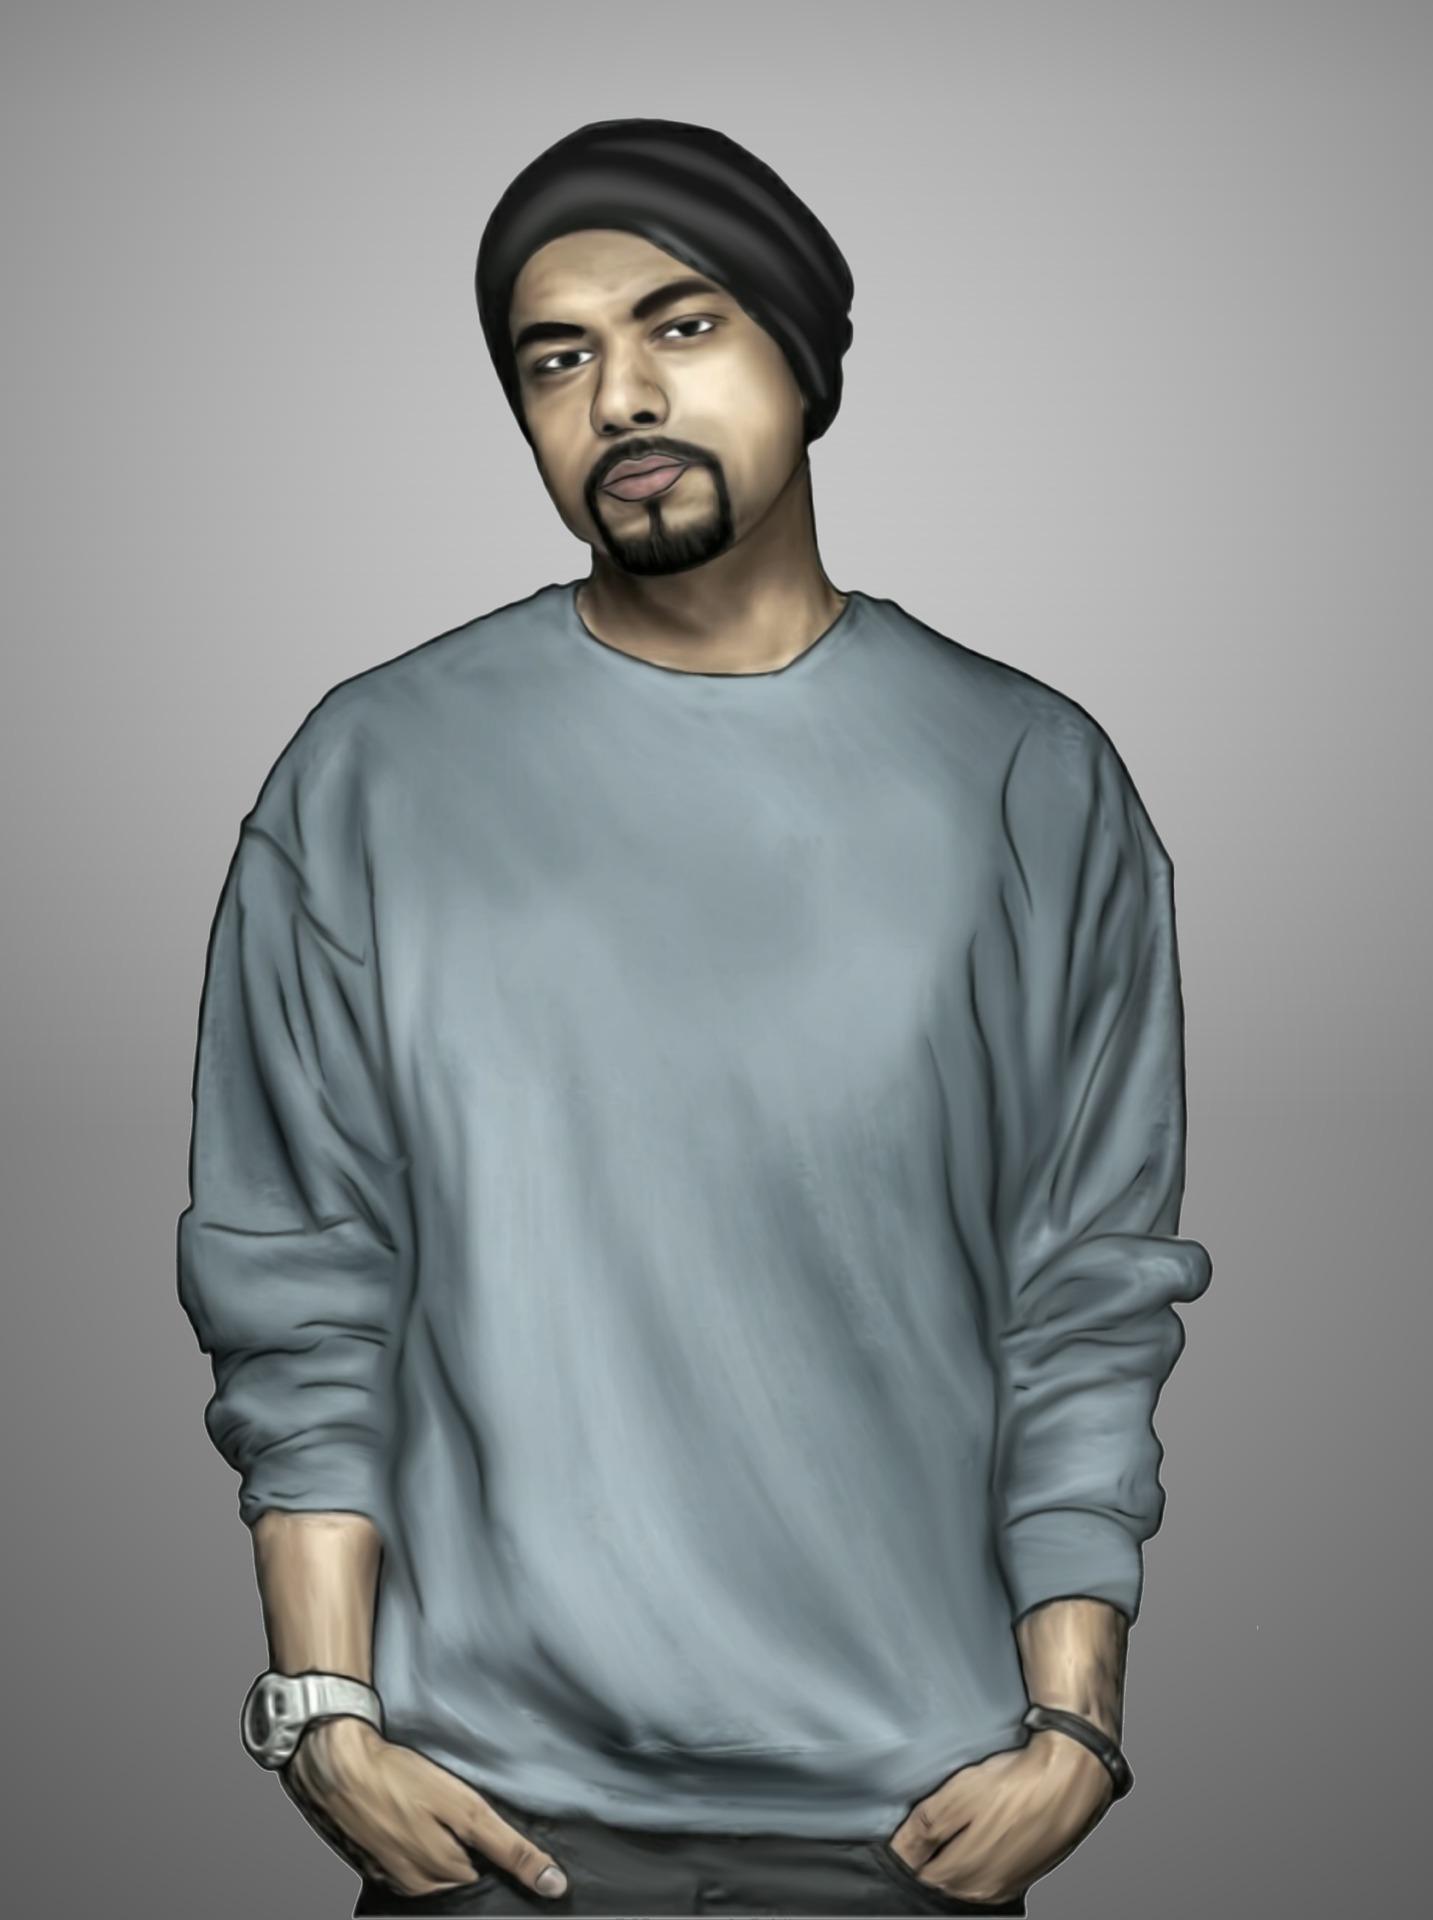 punjabi-rapper-punjabi-songs-entertainments-saga-latest-entertainment-news-in-India